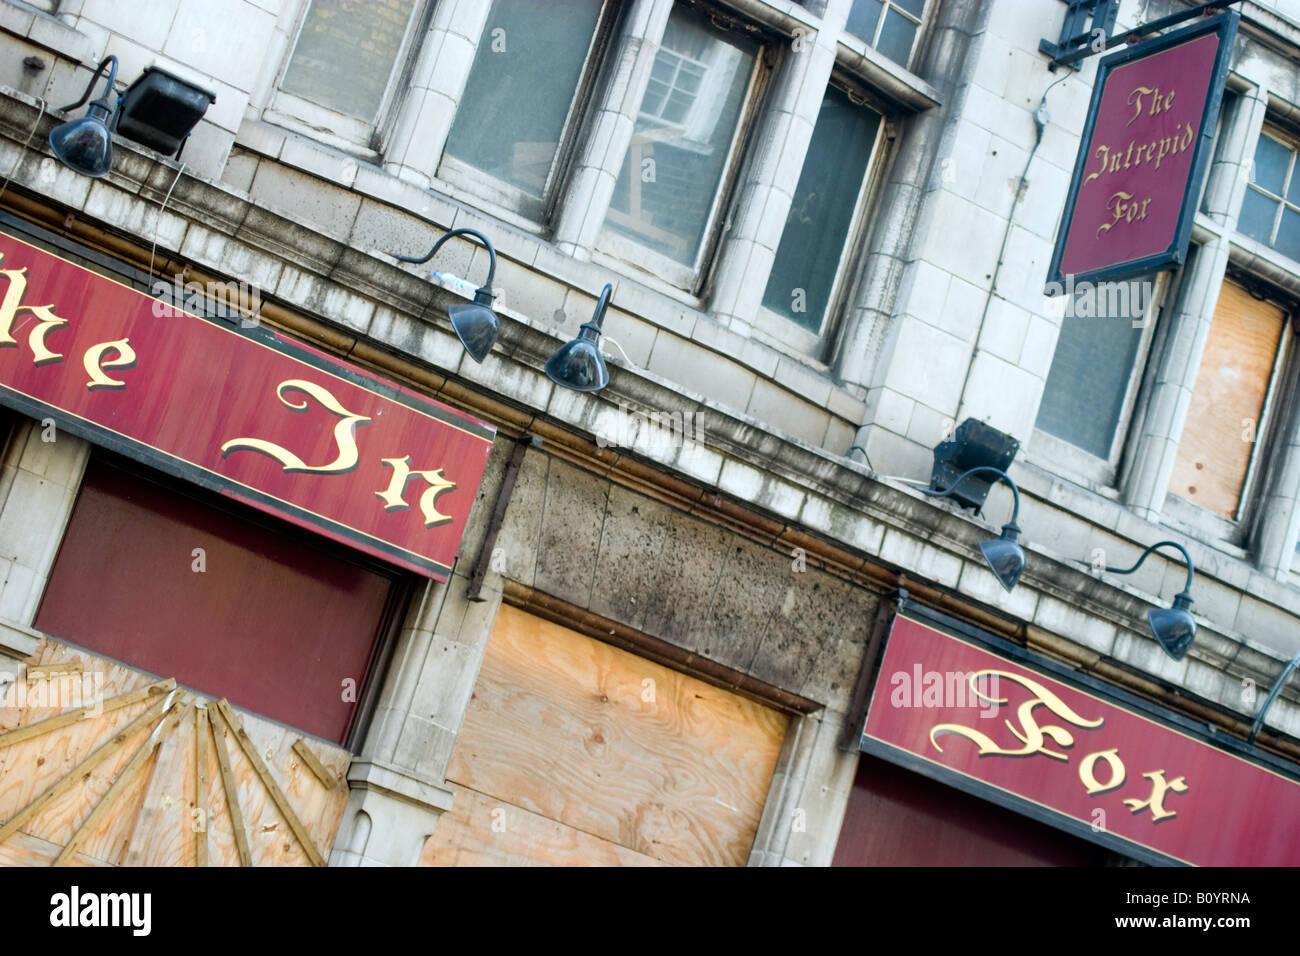 The Intrepid Fox Pub, Wardour Street, Soho, Closed and Boarded Up. - Stock Image